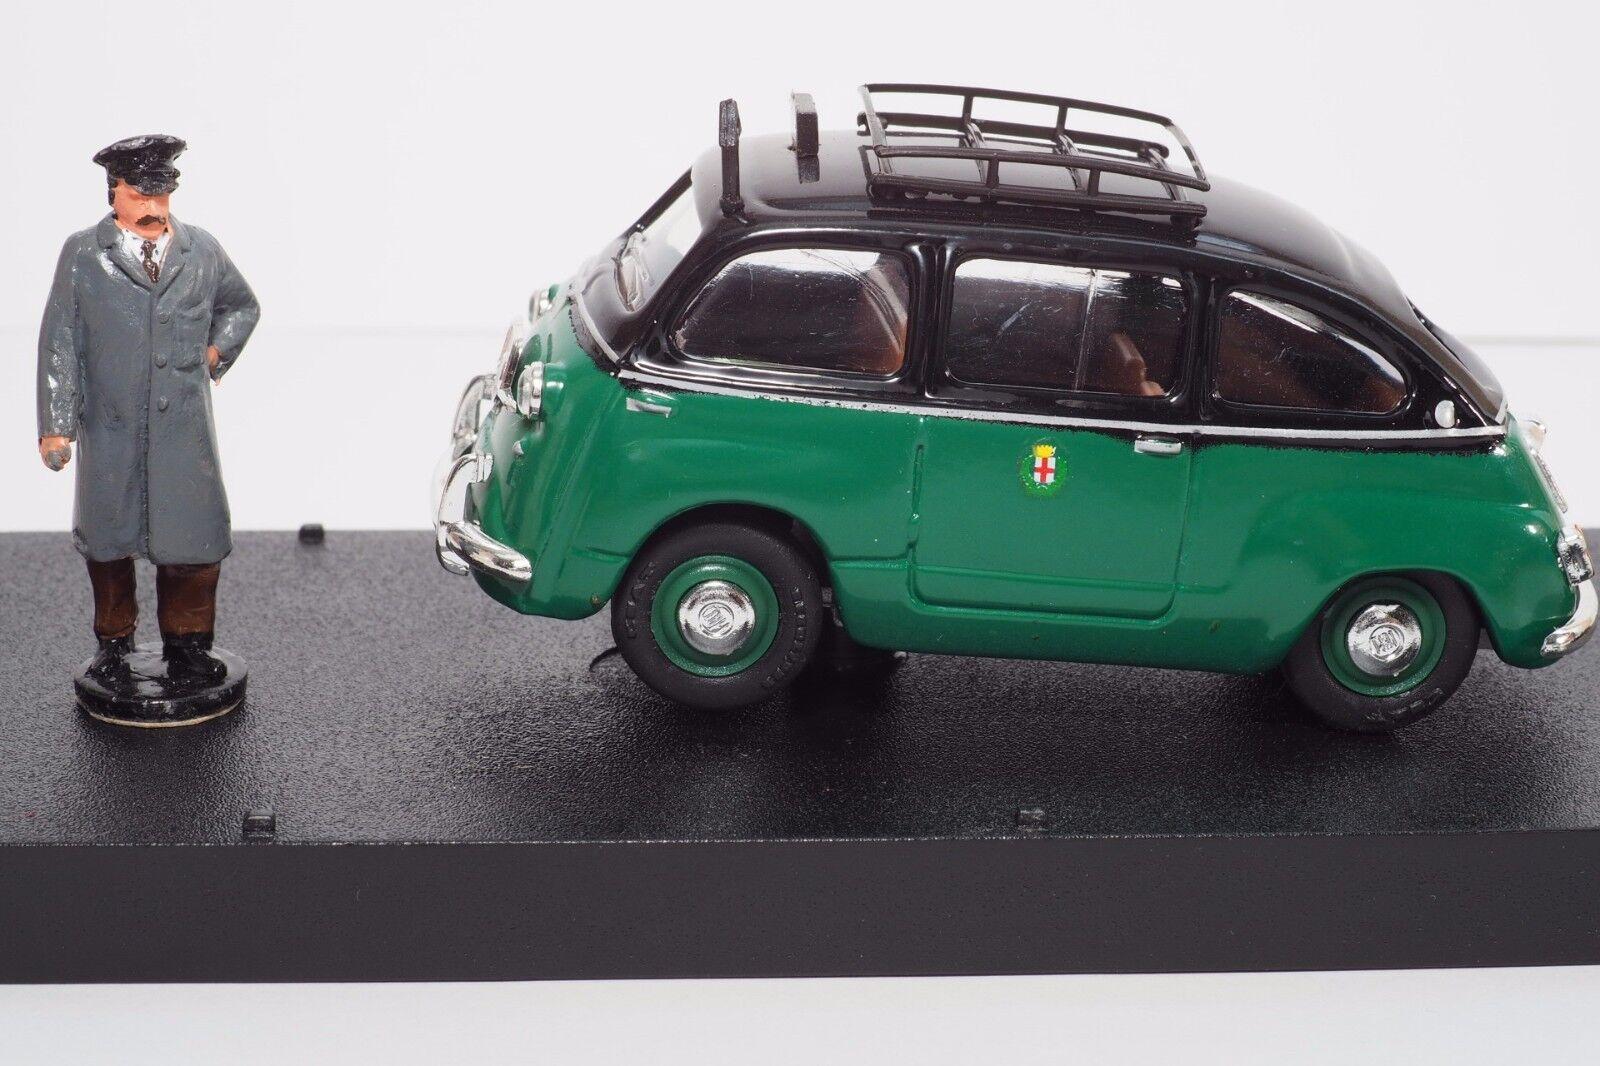 1 43 Giocher GR11 Fiat 600D Multipla Taxi Rome w  figure